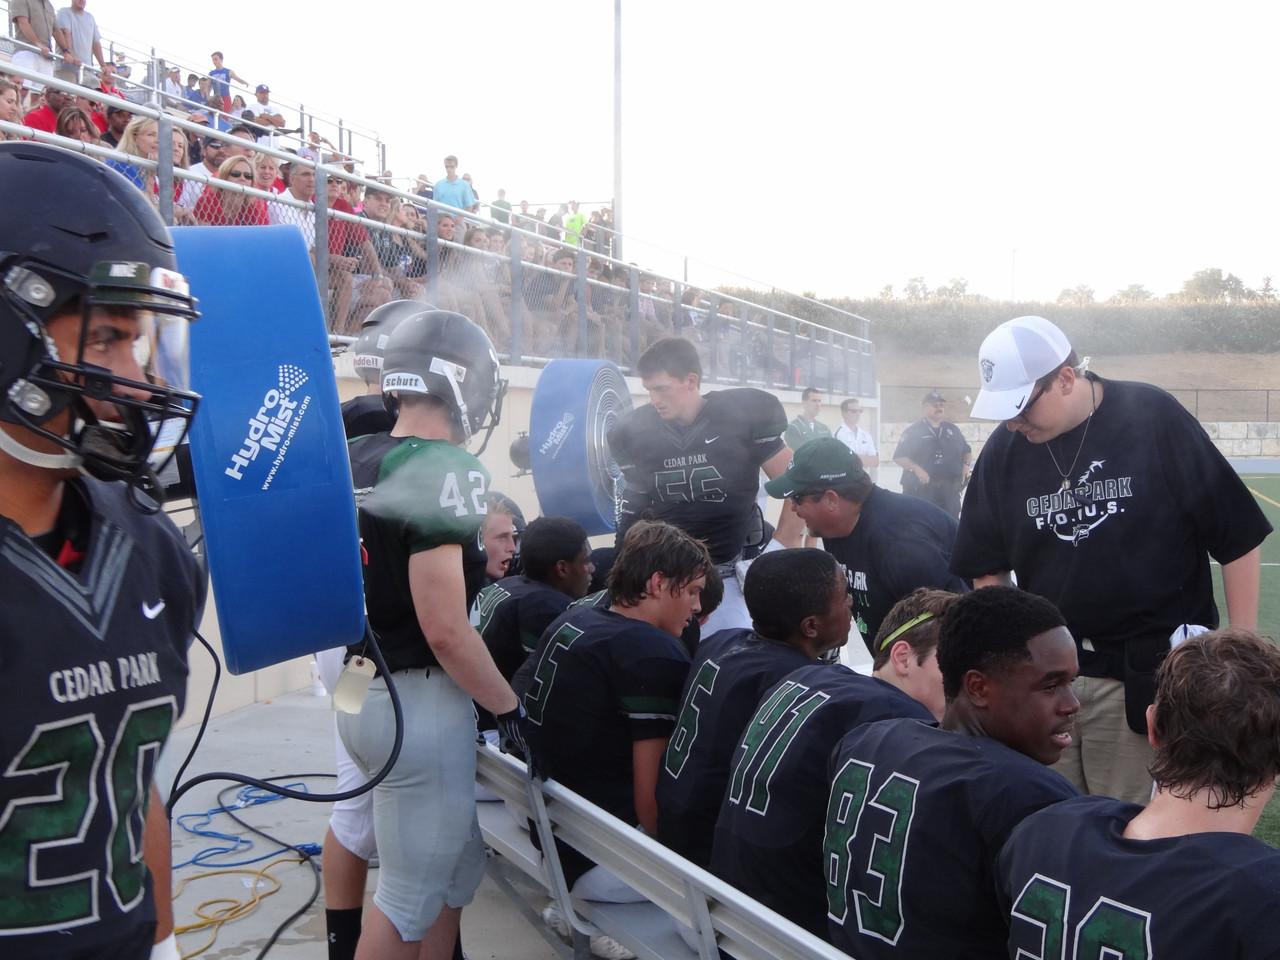 NFL Sideline Misting Fans Now Affordable for High School Football Budgets